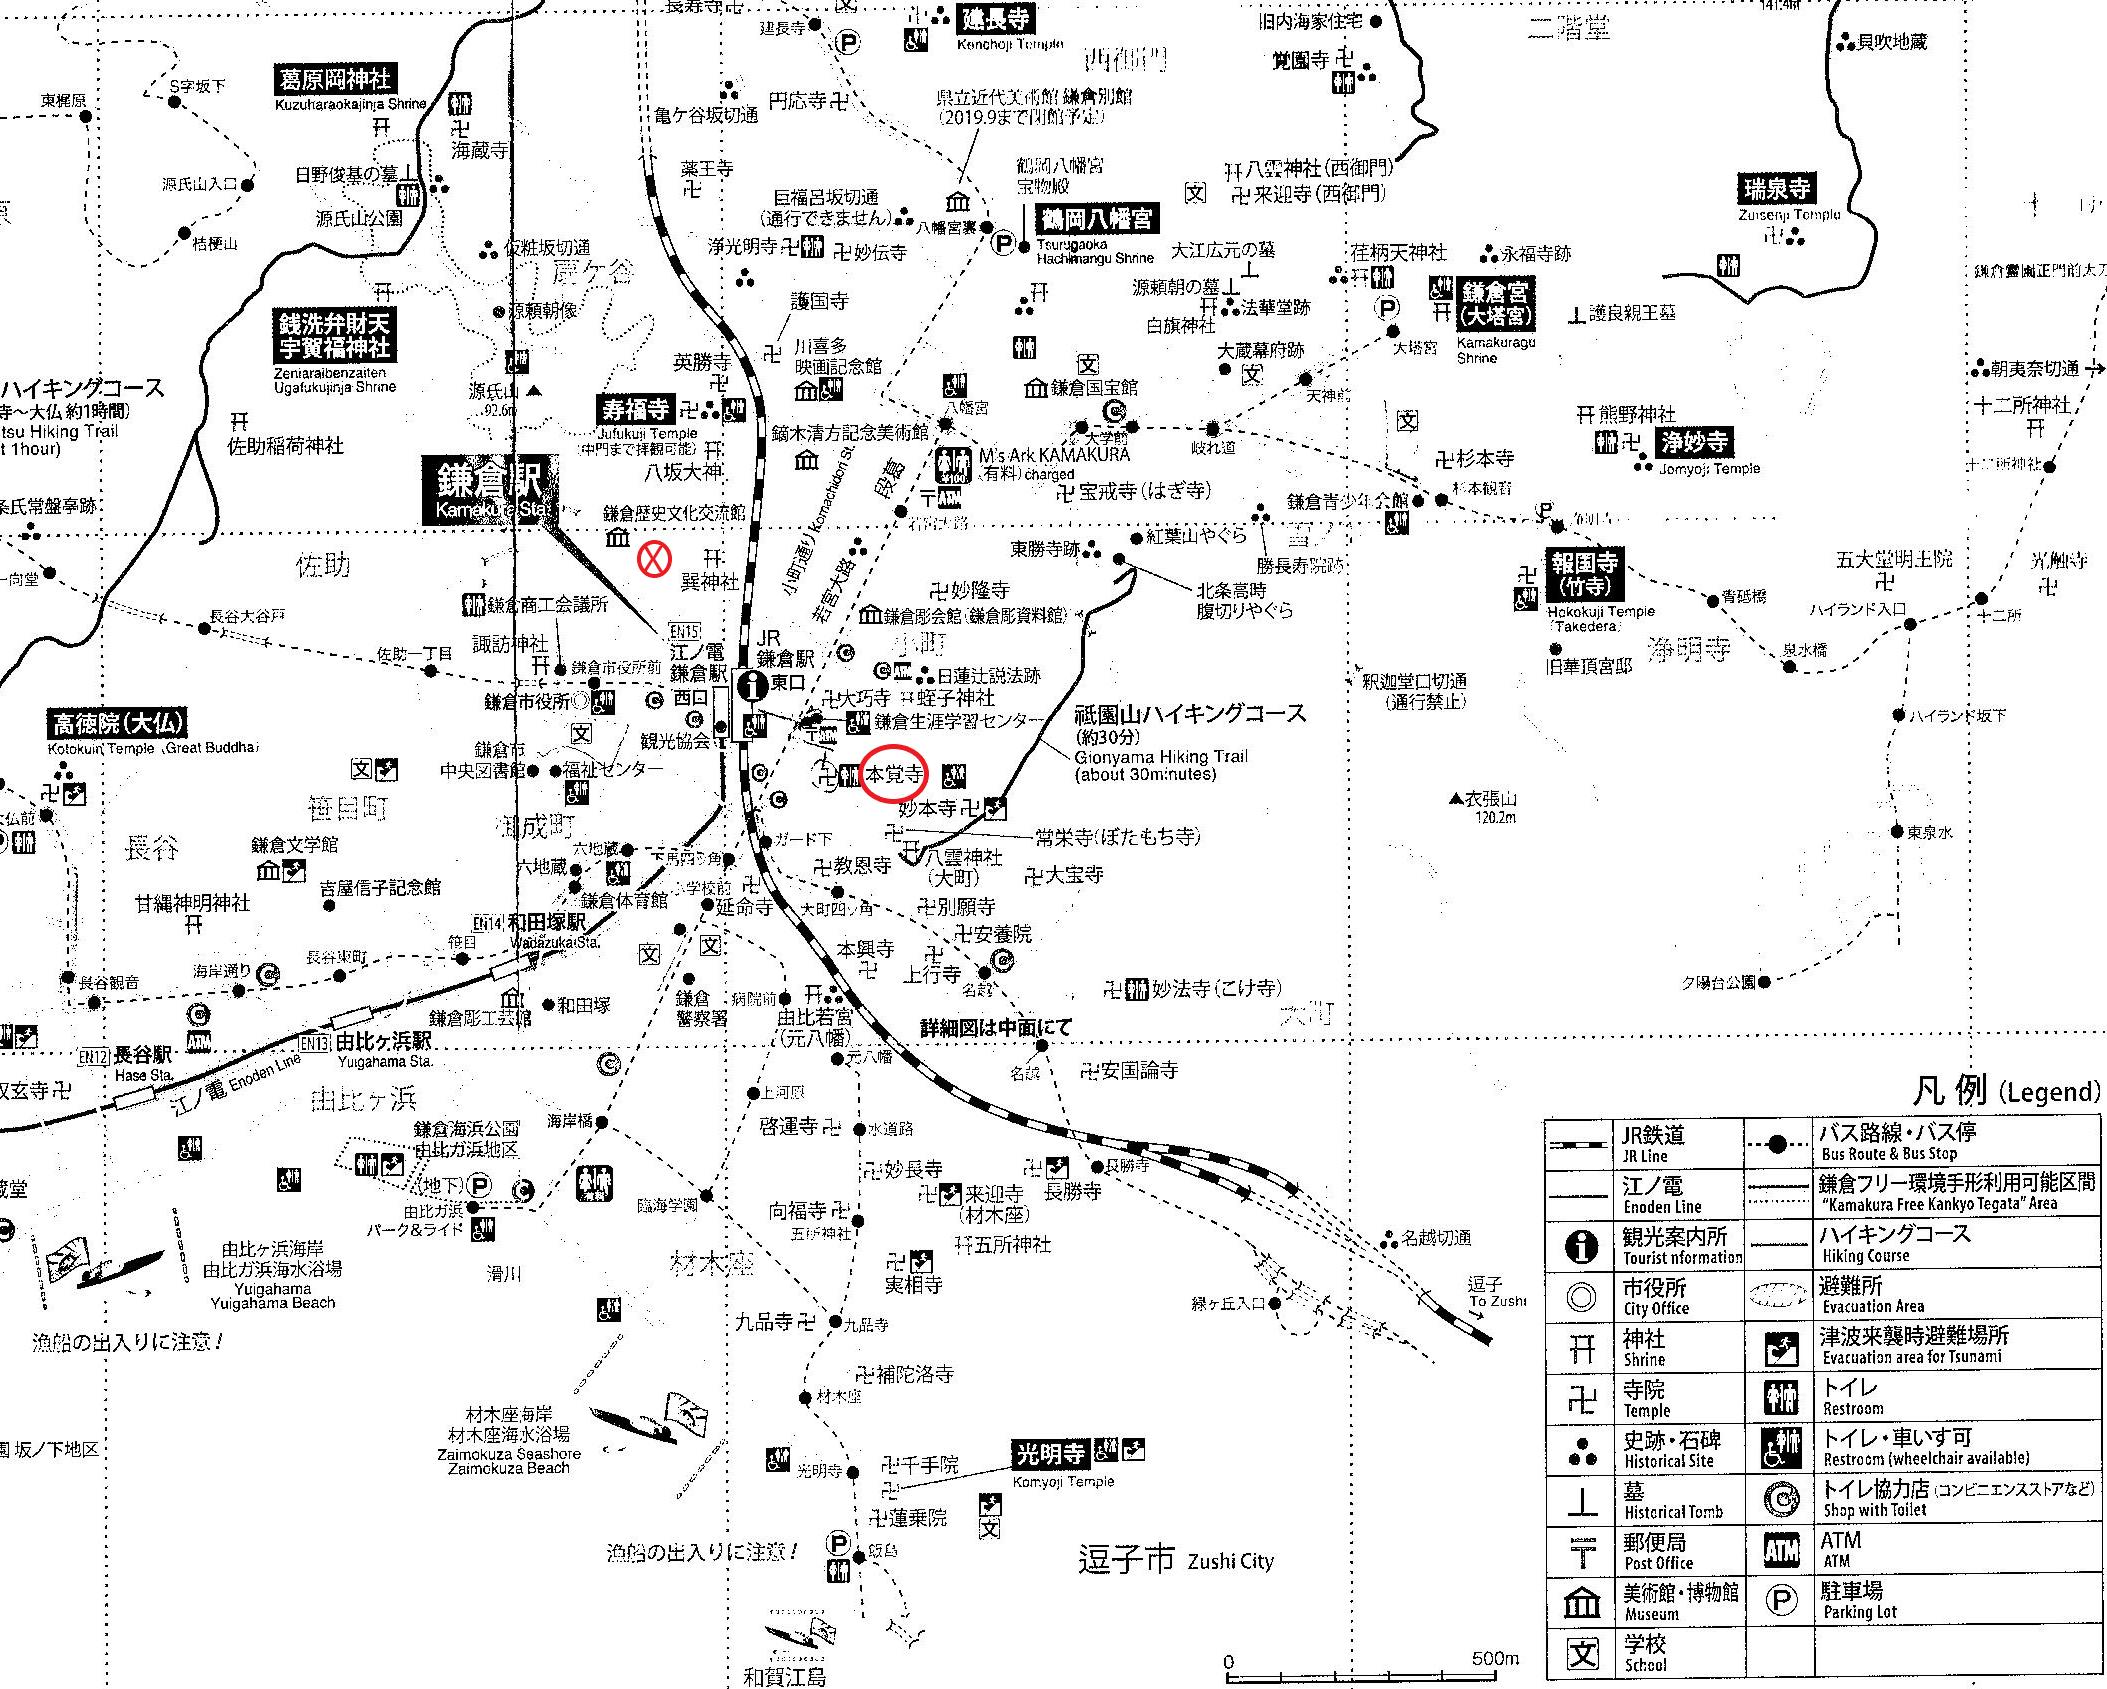 54 Honkakuji map in red